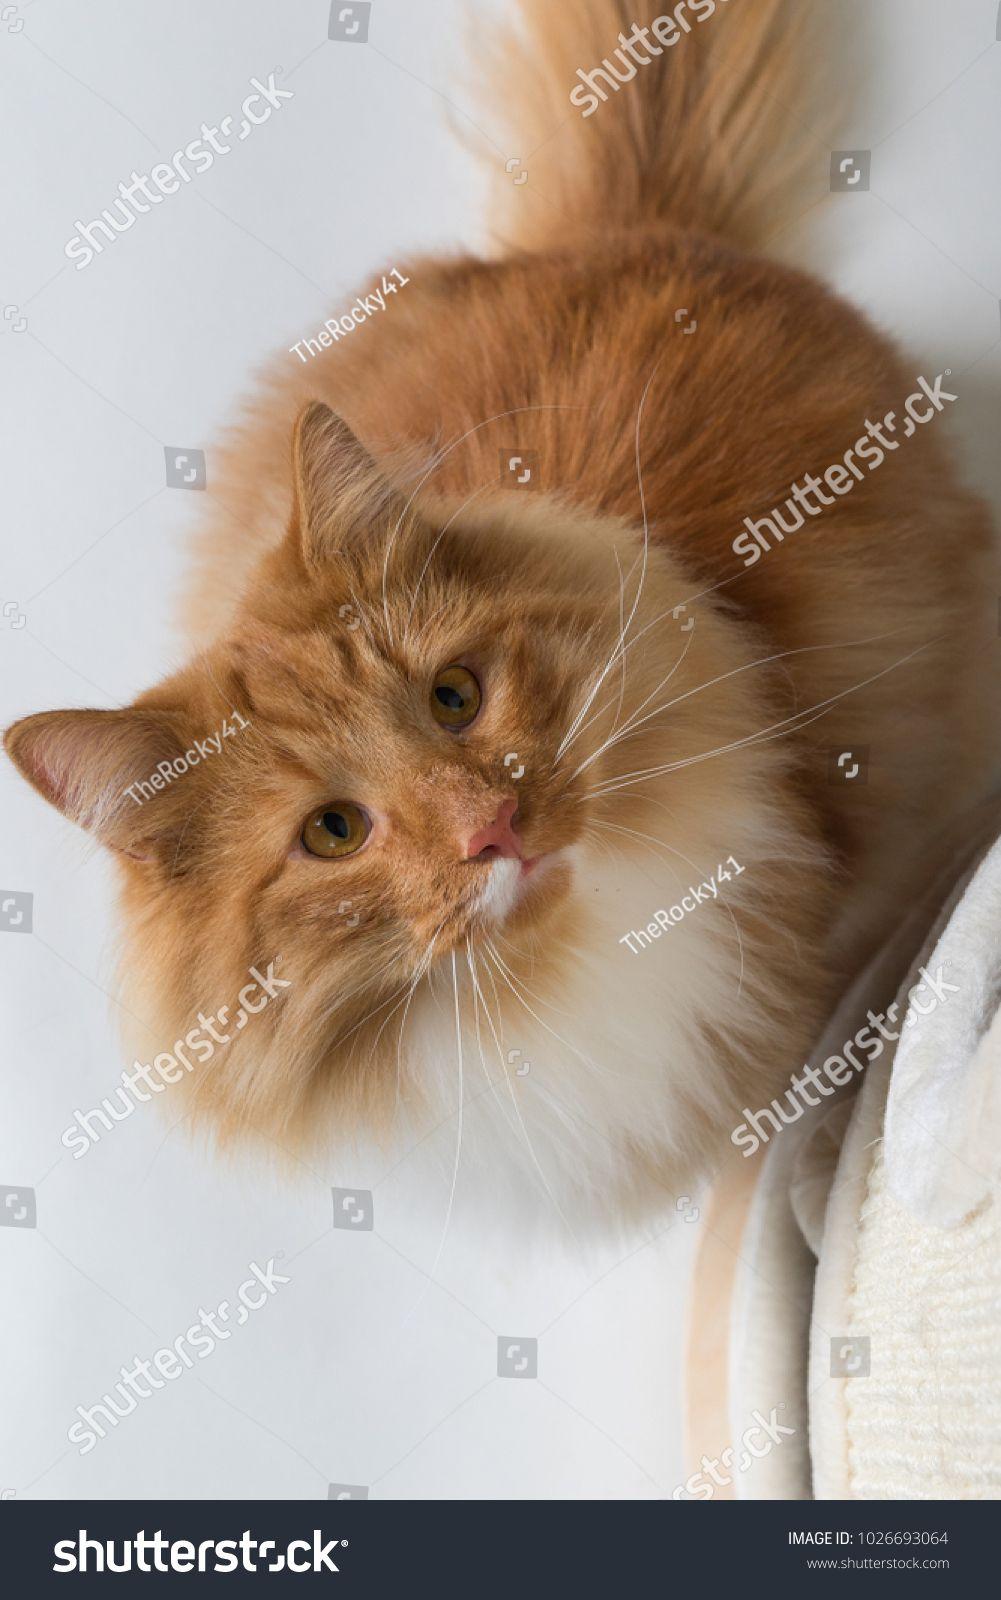 Portrait Of Beautiful White And Orange Long Haired Norwegian